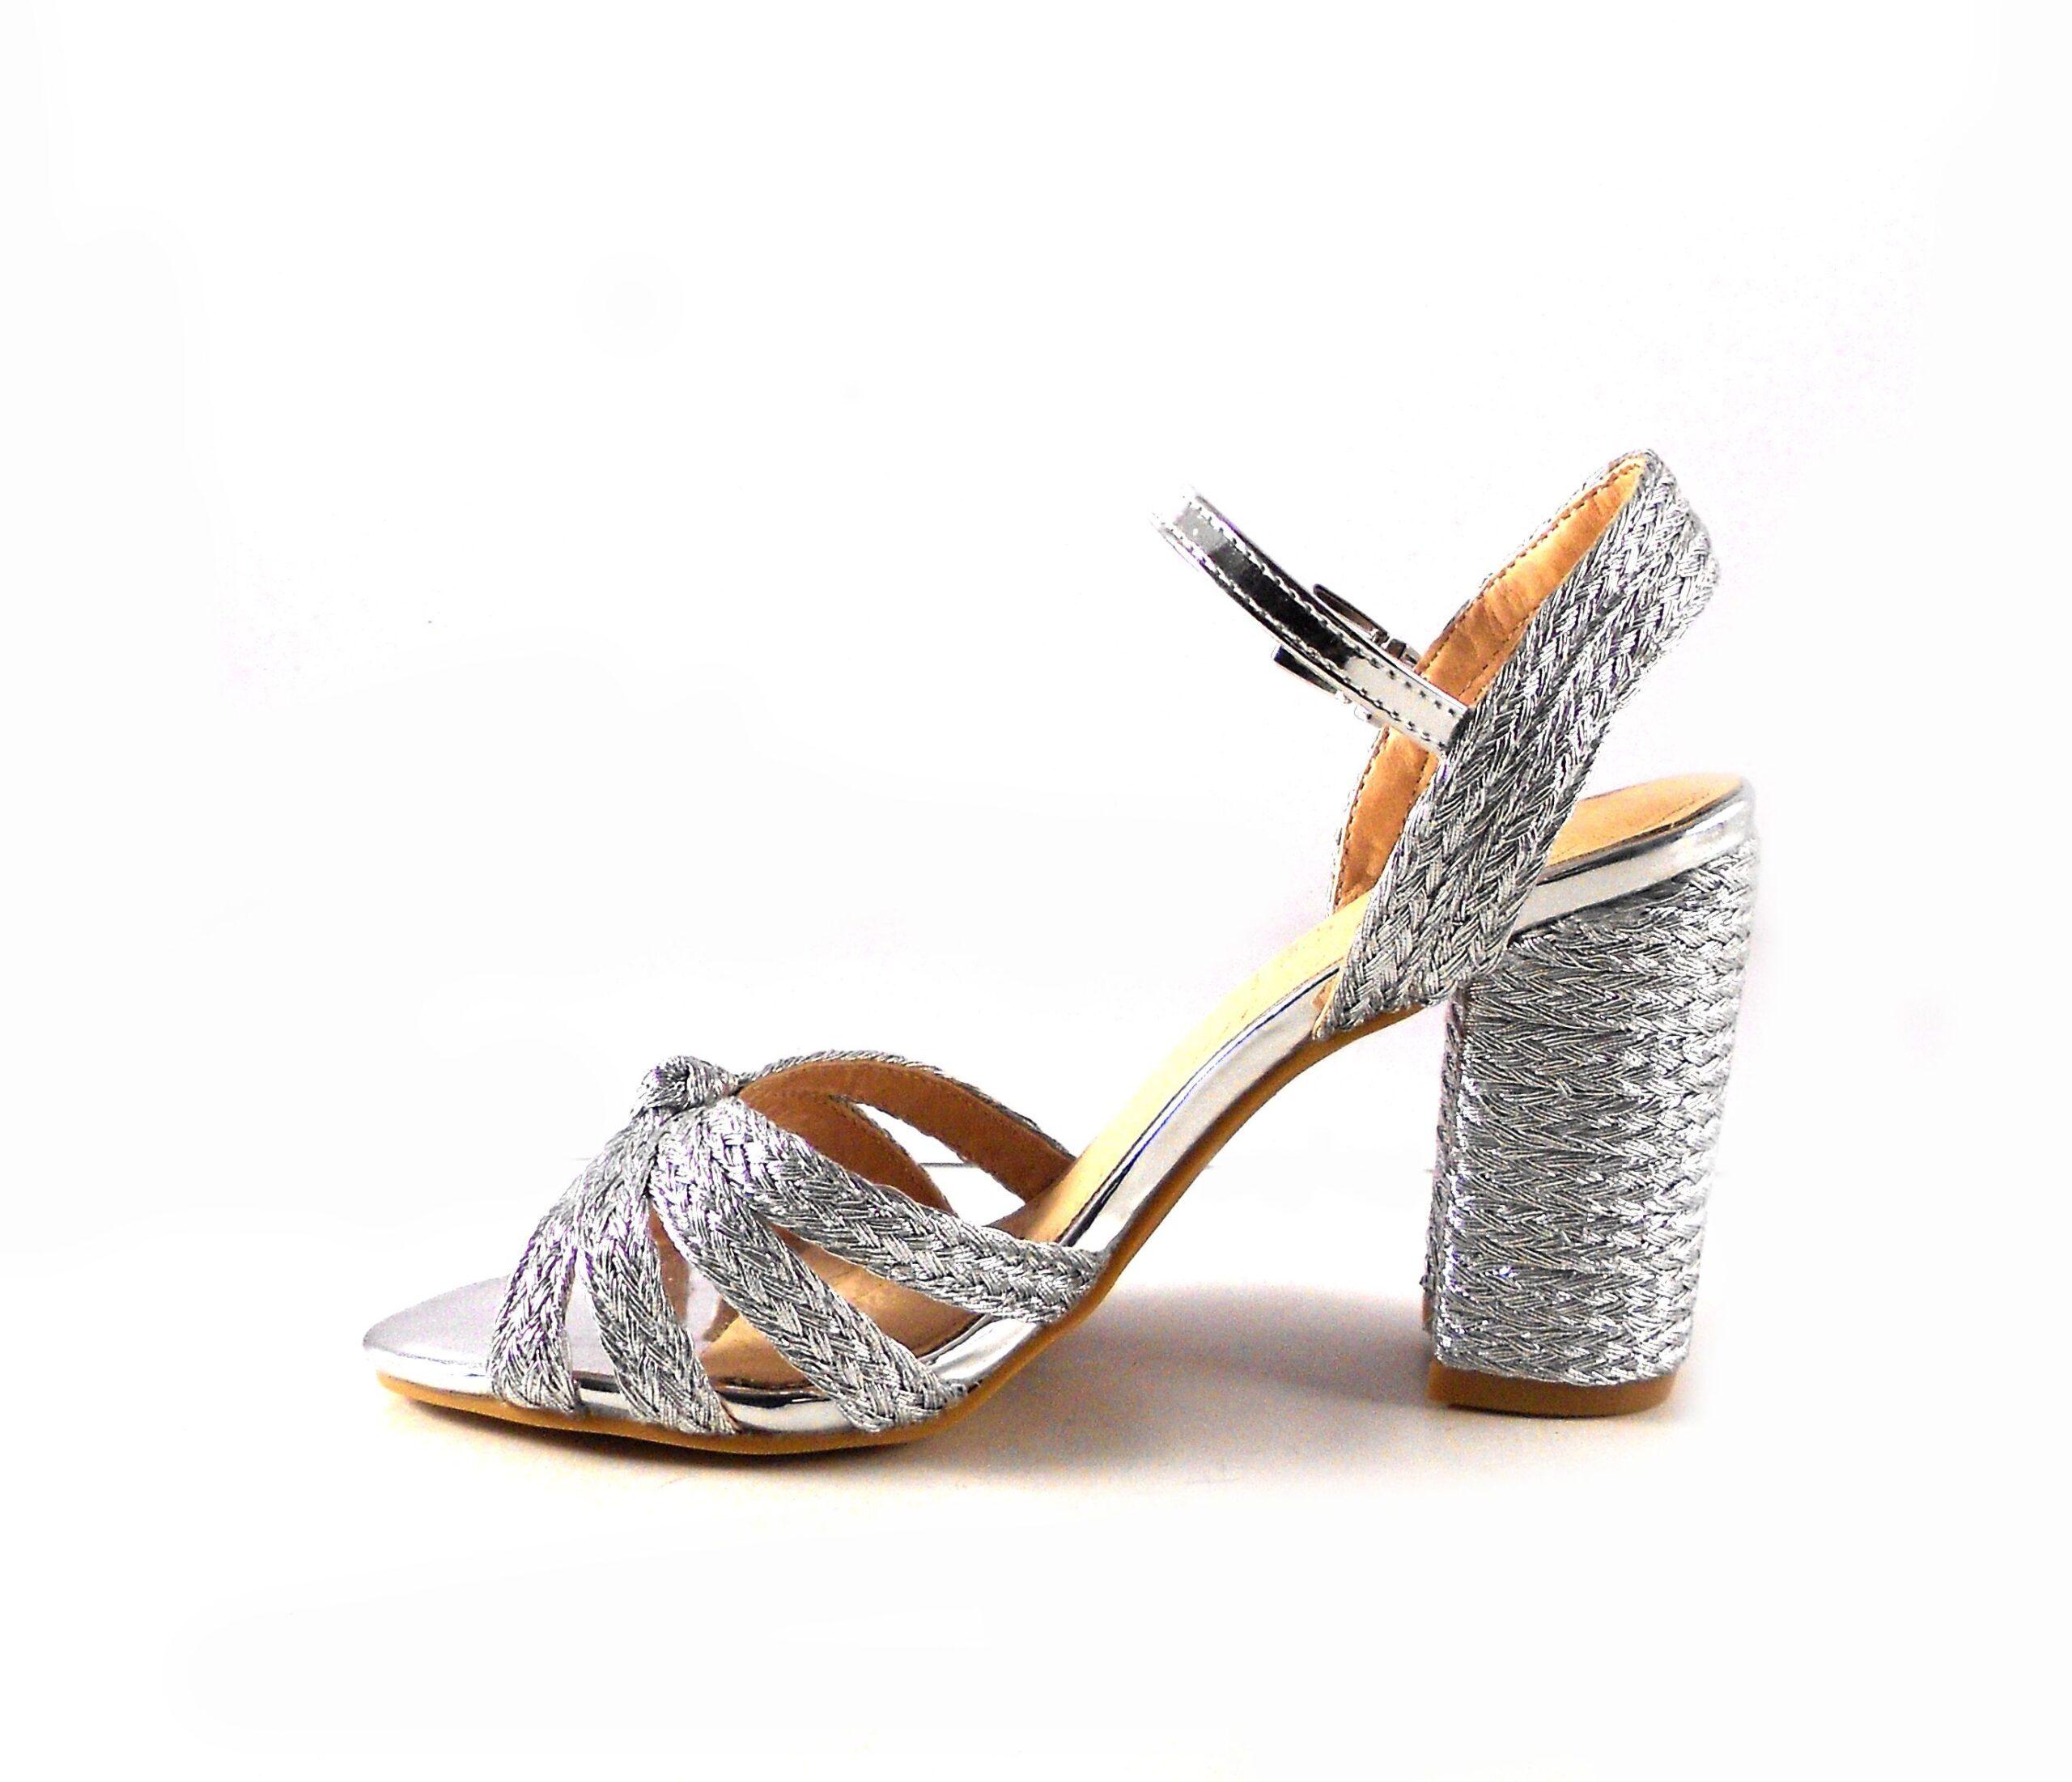 Sandalias fiesta mujer E.Ferri plata de tiras trenzadas